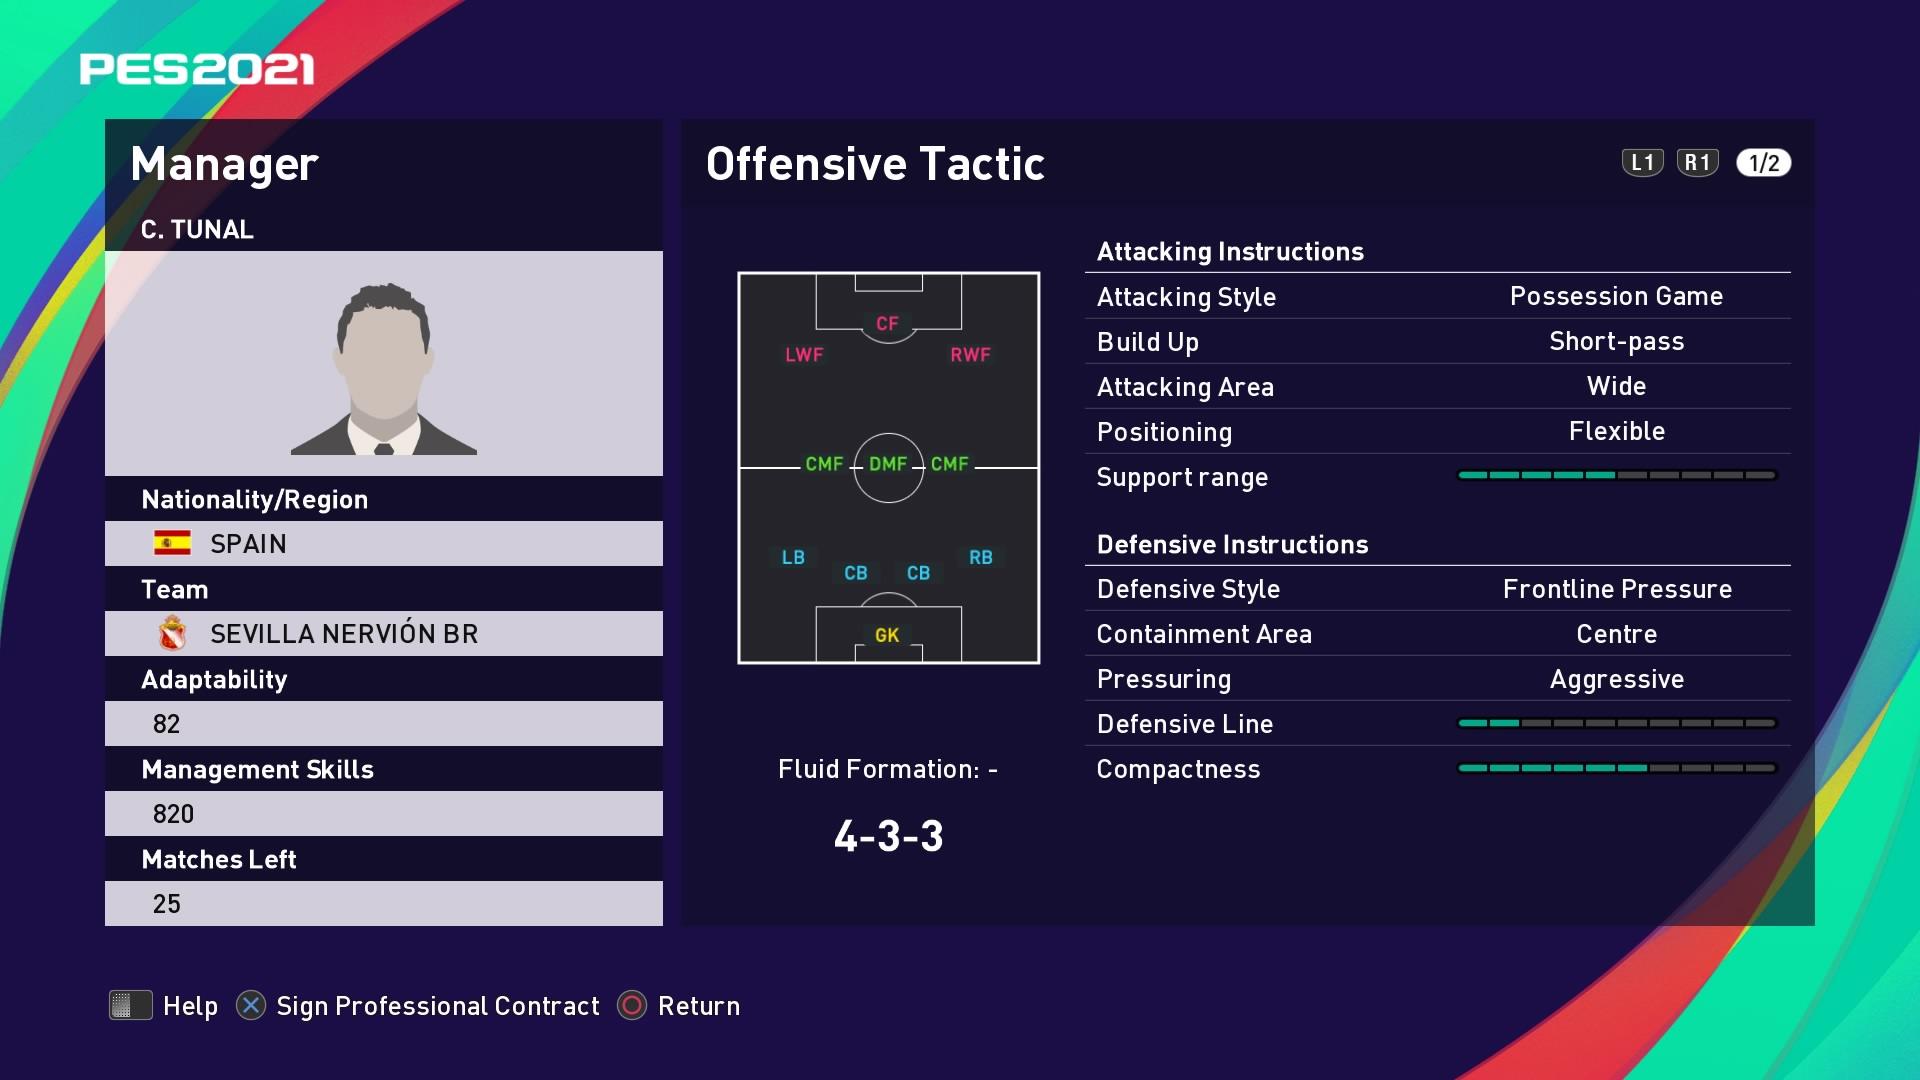 C. Tunal (Julen Lopetegui) Offensive Tactic in PES 2021 myClub